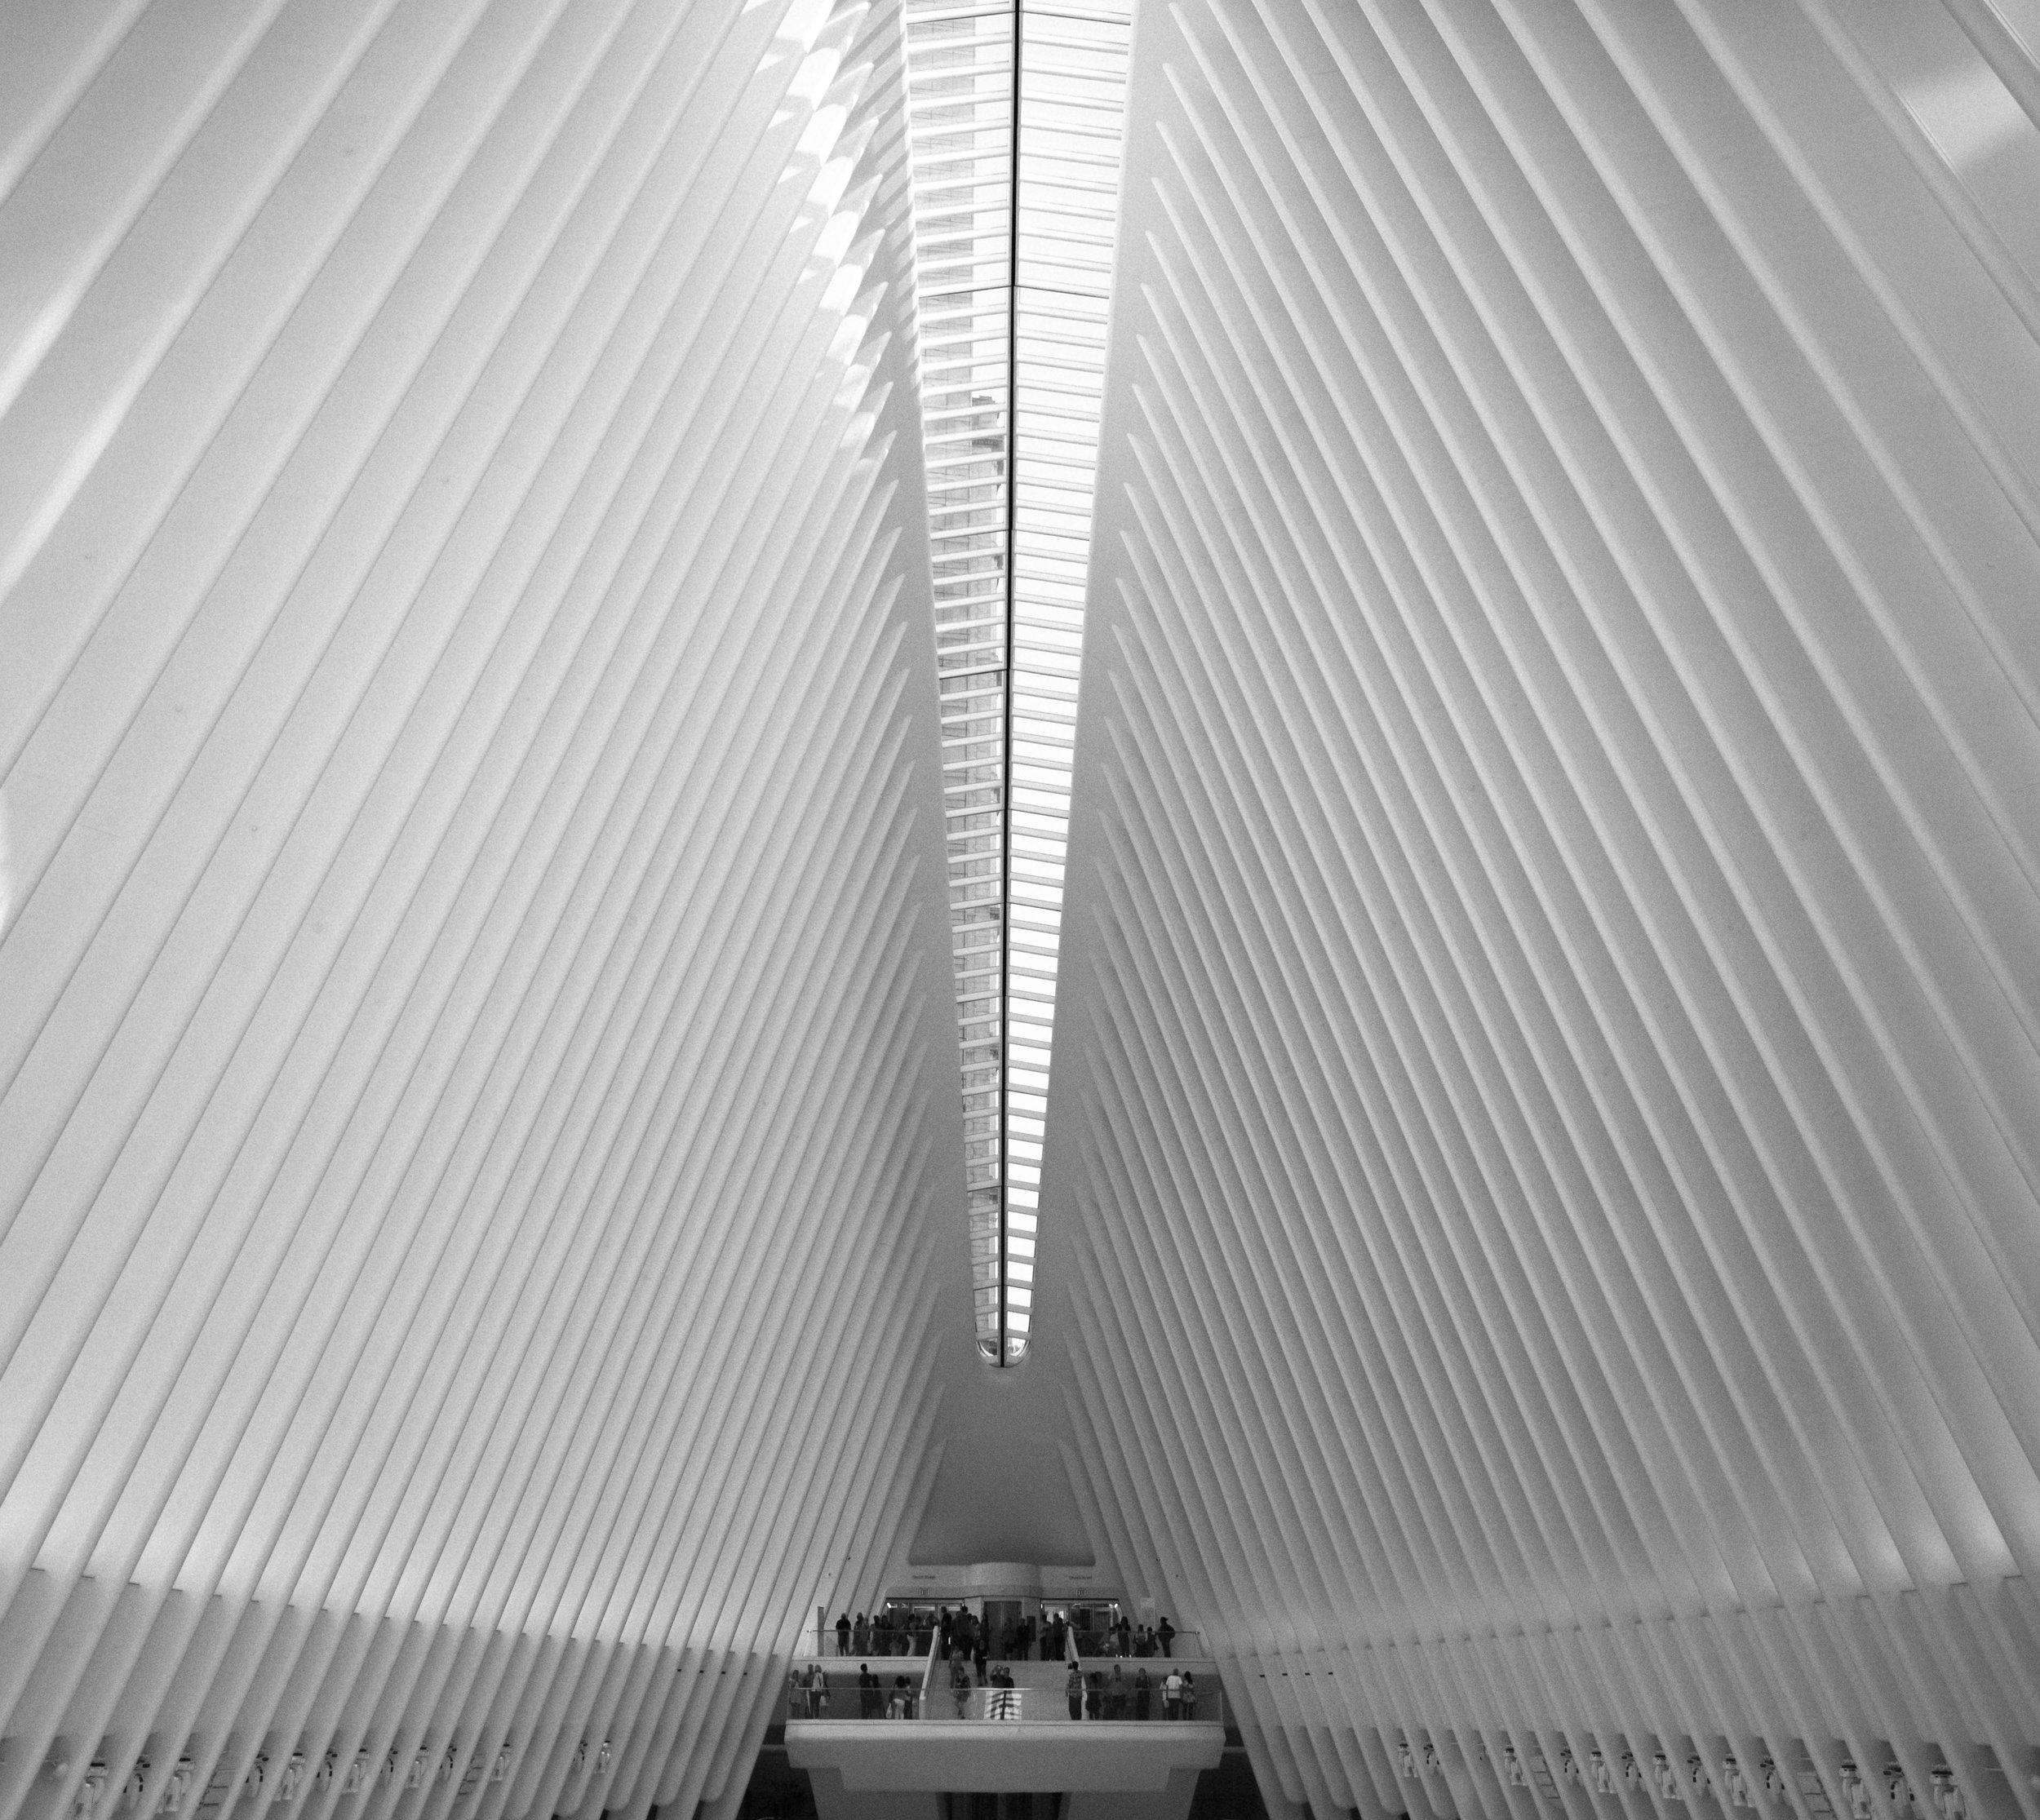 newyorkWW_20.JPG